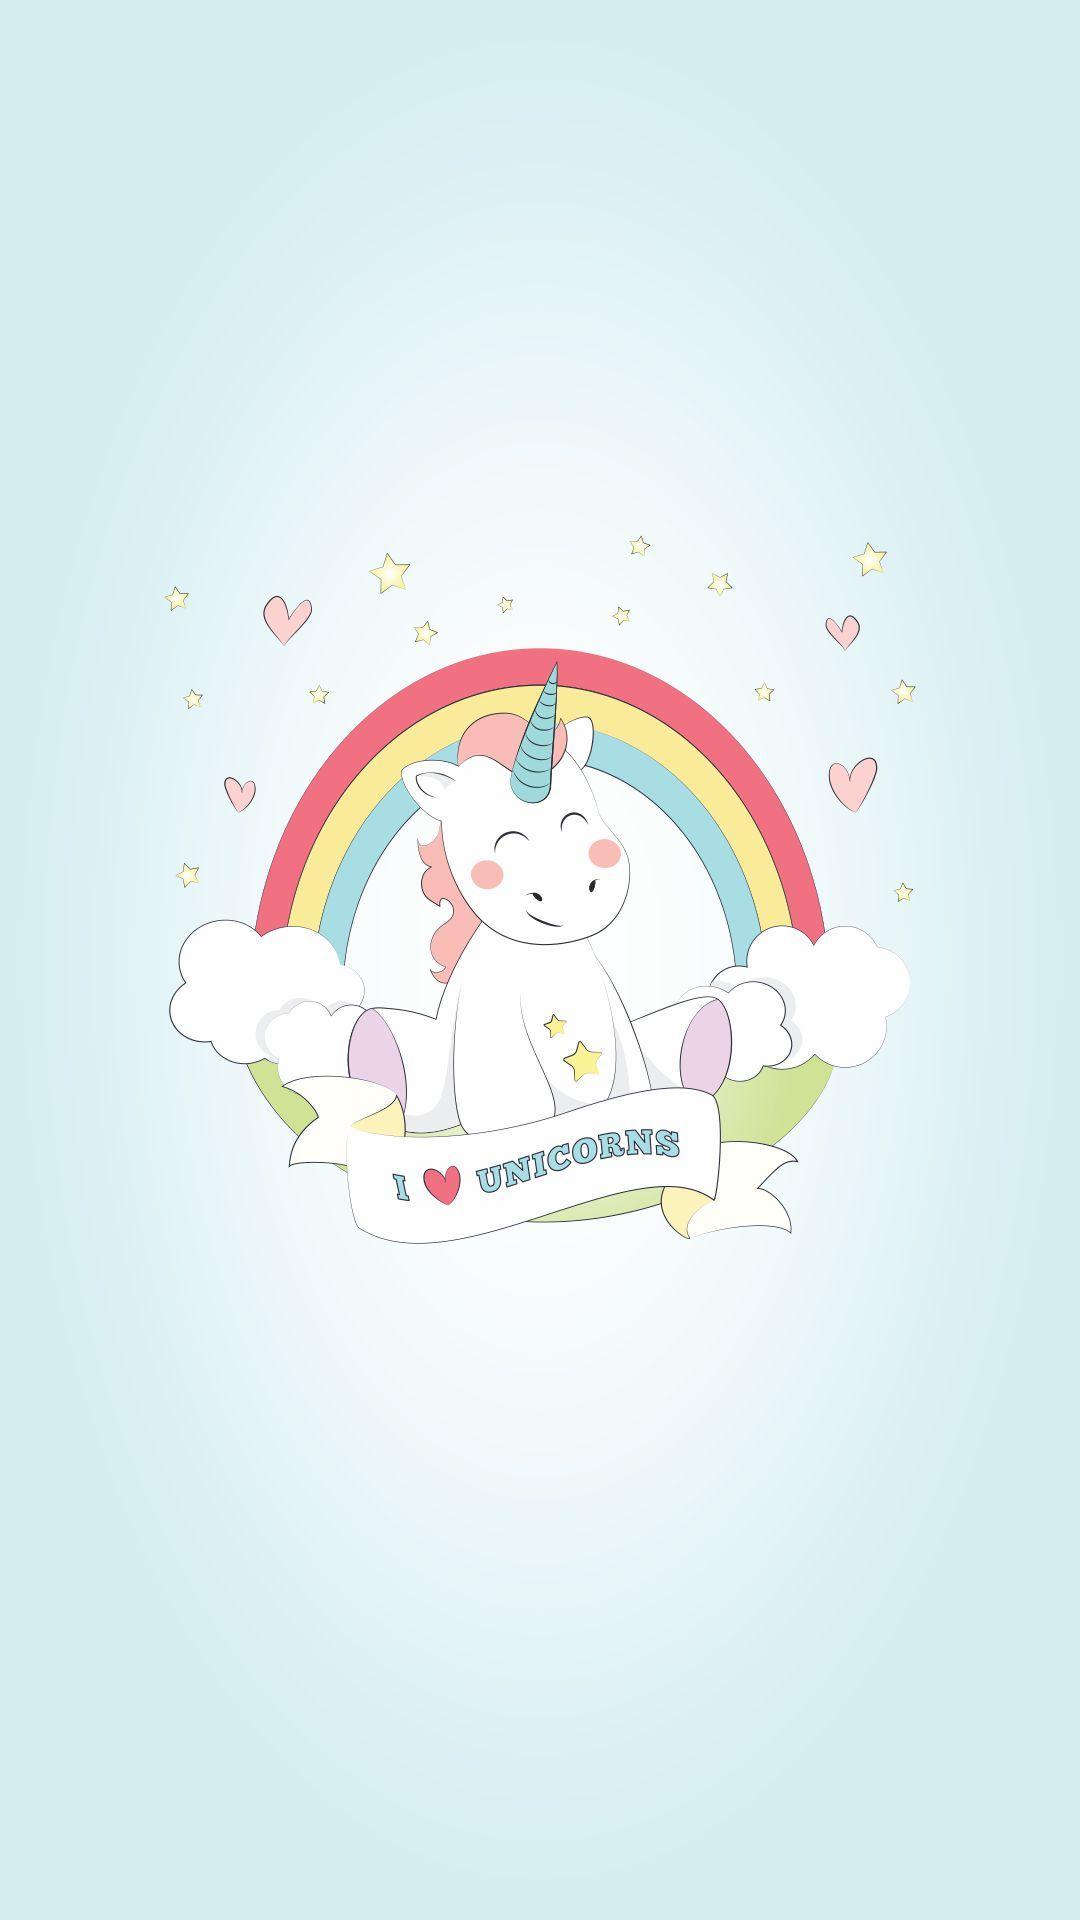 Wallpaper iphone tumblr unicorn - I Love Unicorn Wallpaper